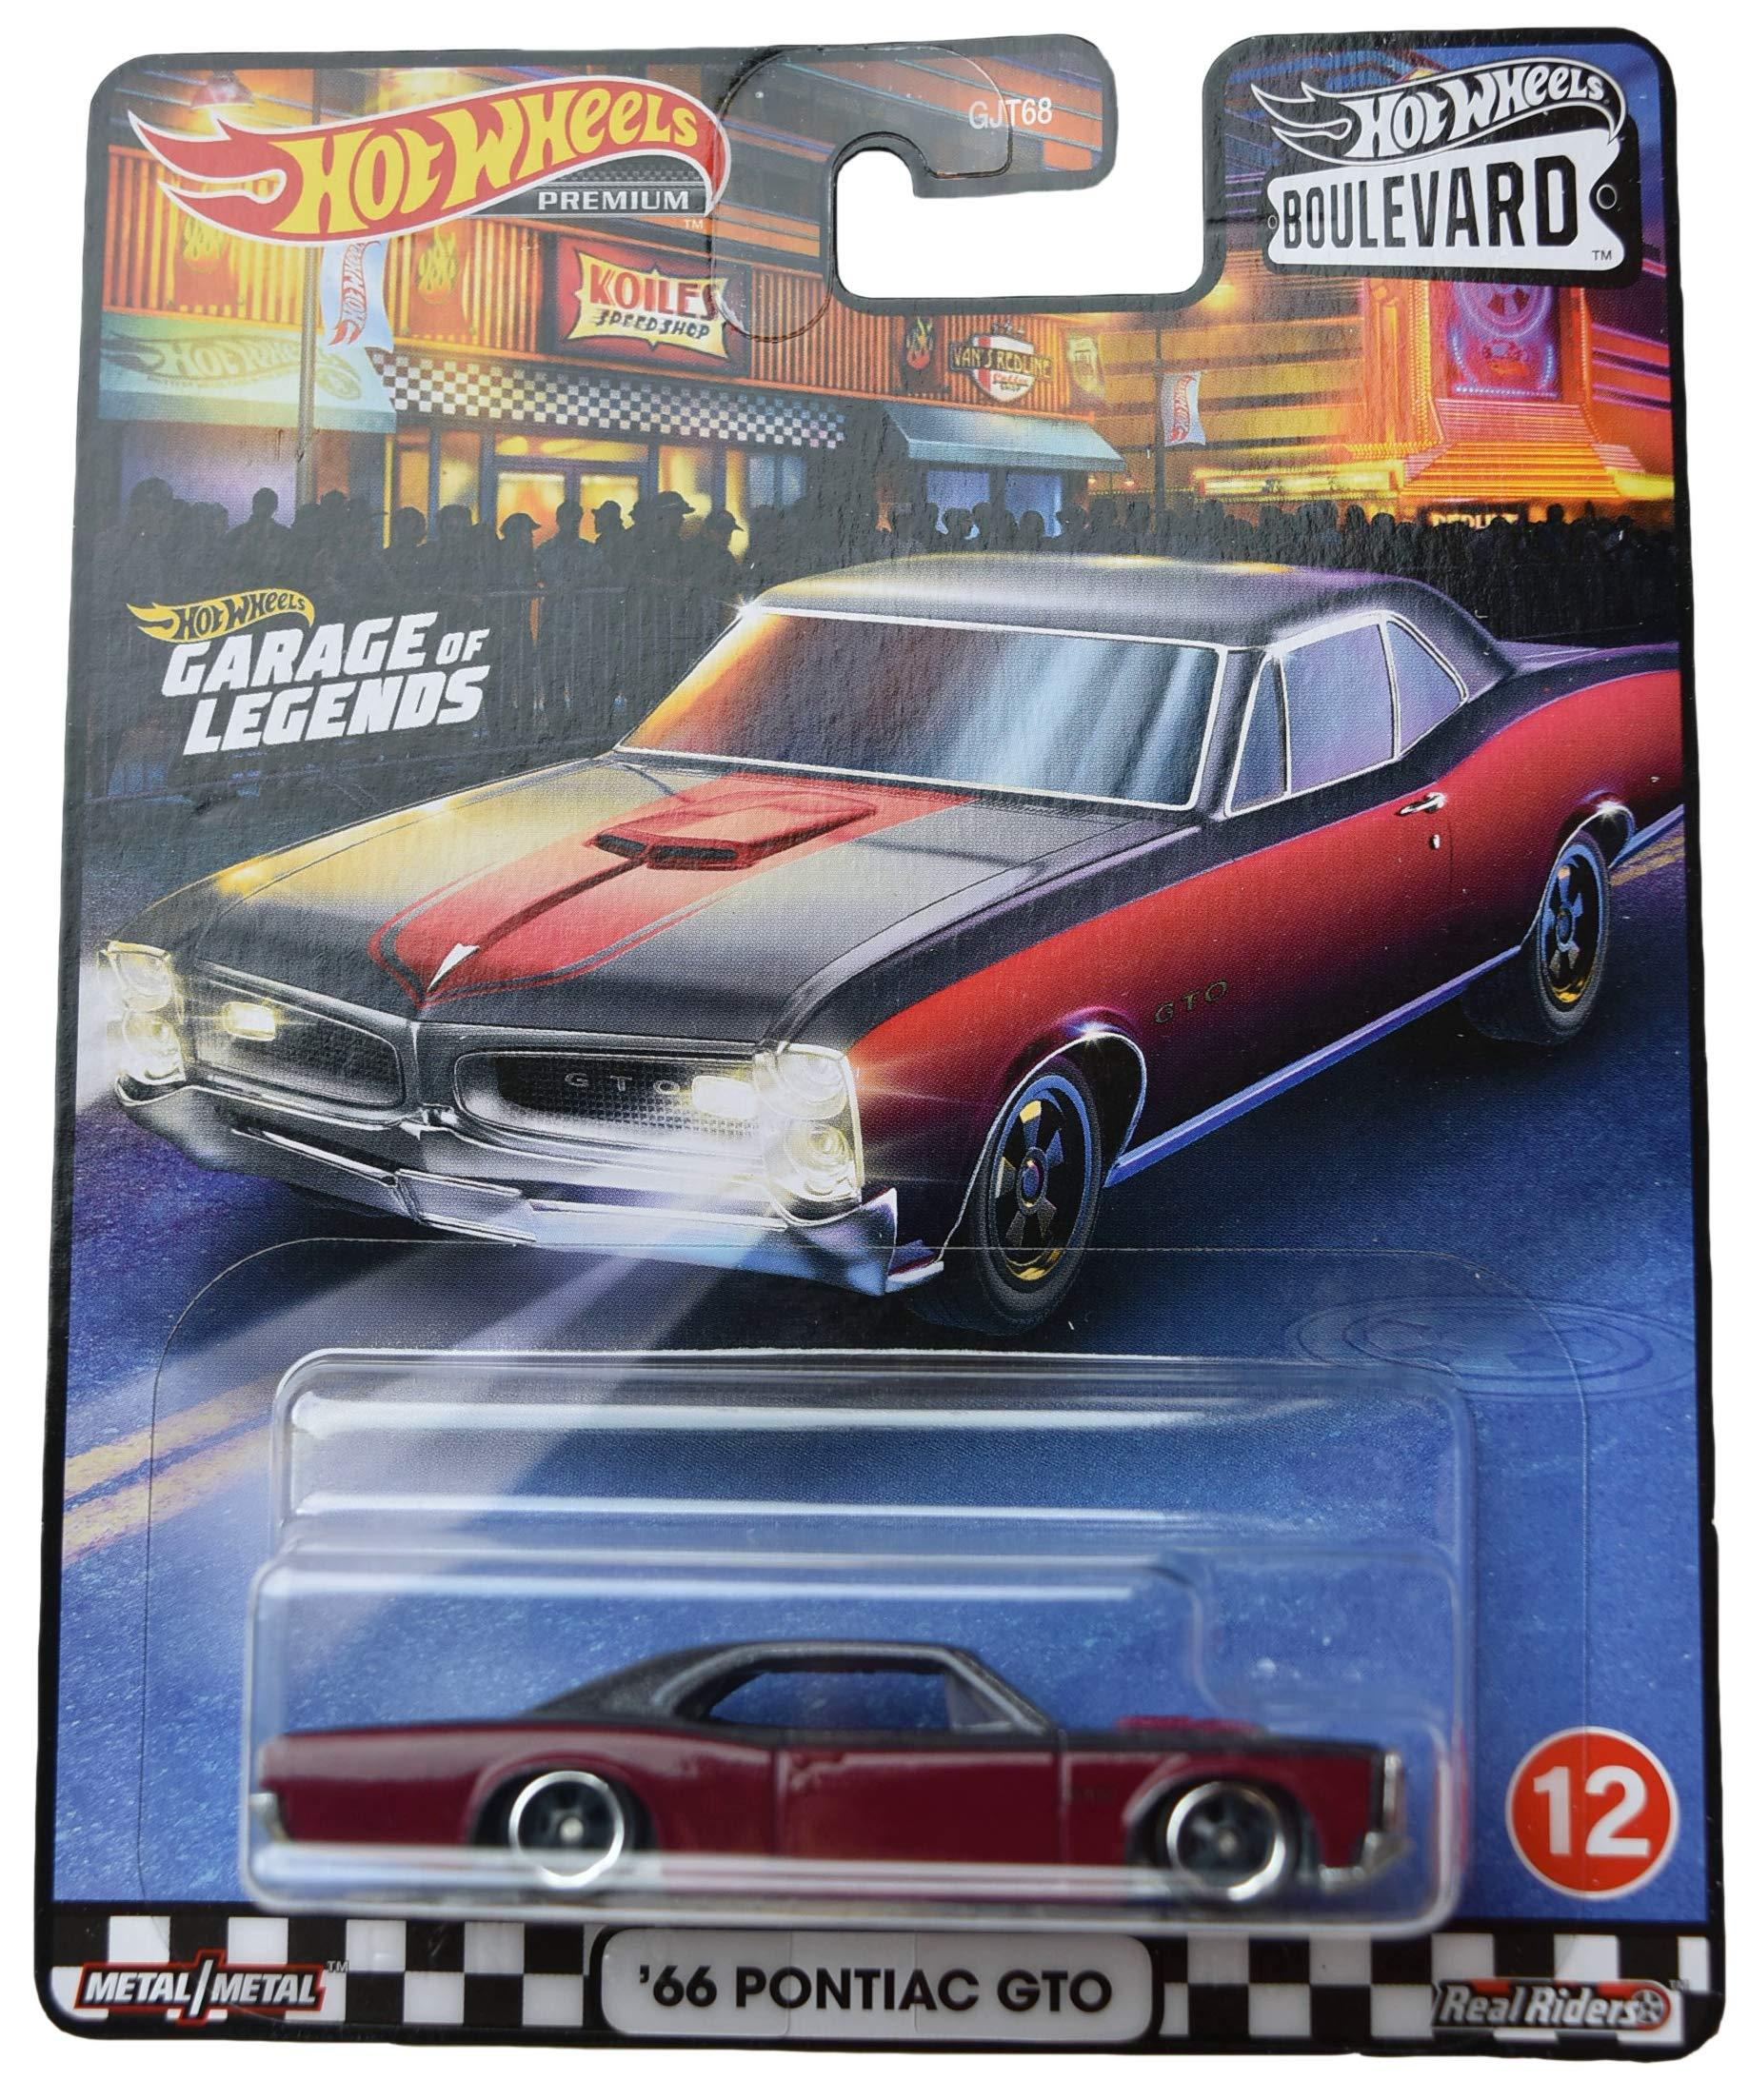 Mattel Hot Wheels Boulevard '66 Pontiac GTO, red/Gray top